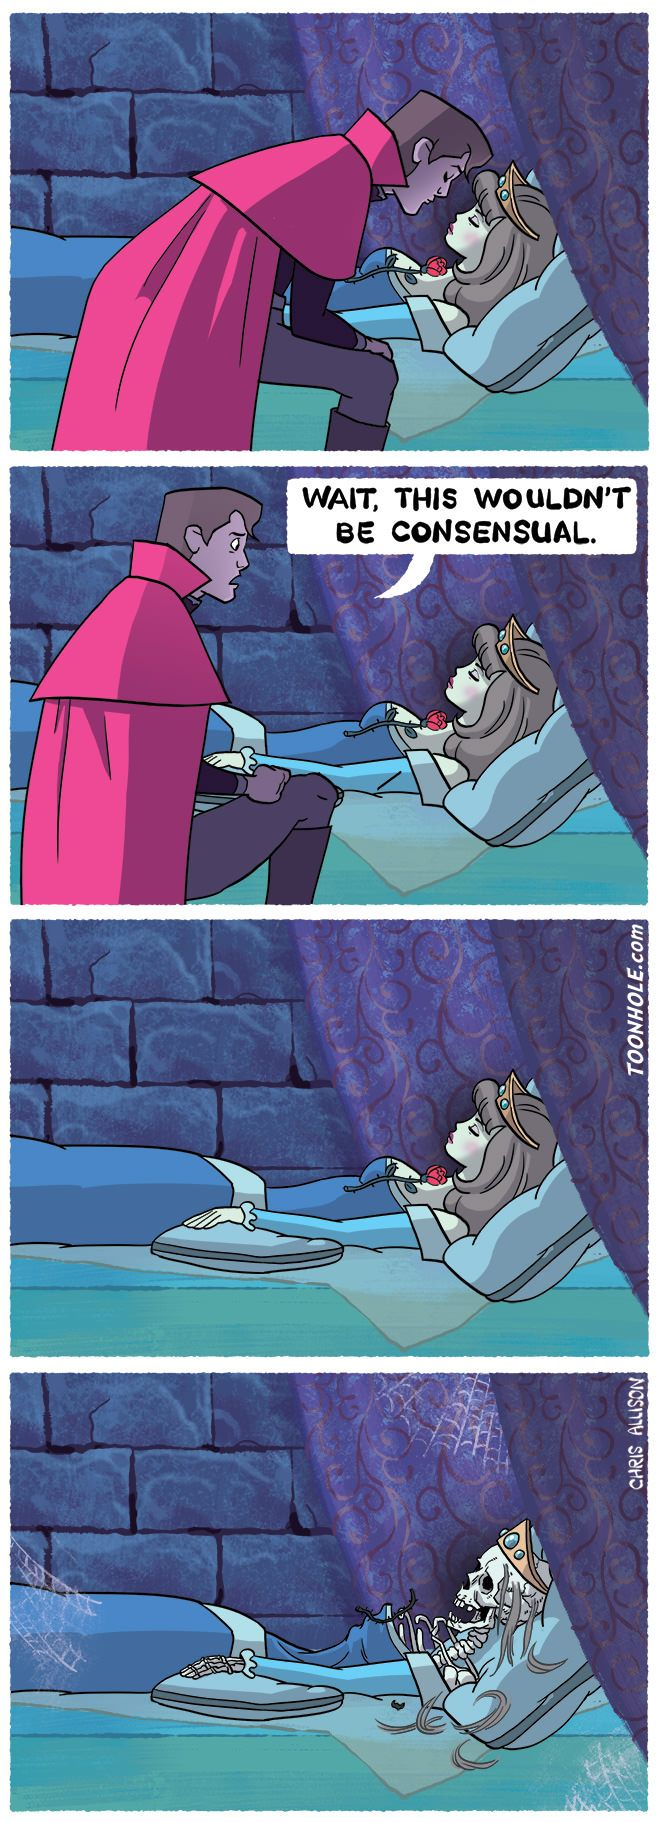 Sleeping Beauty reboot. https://i.imgur.com/SlhmU17.jpg